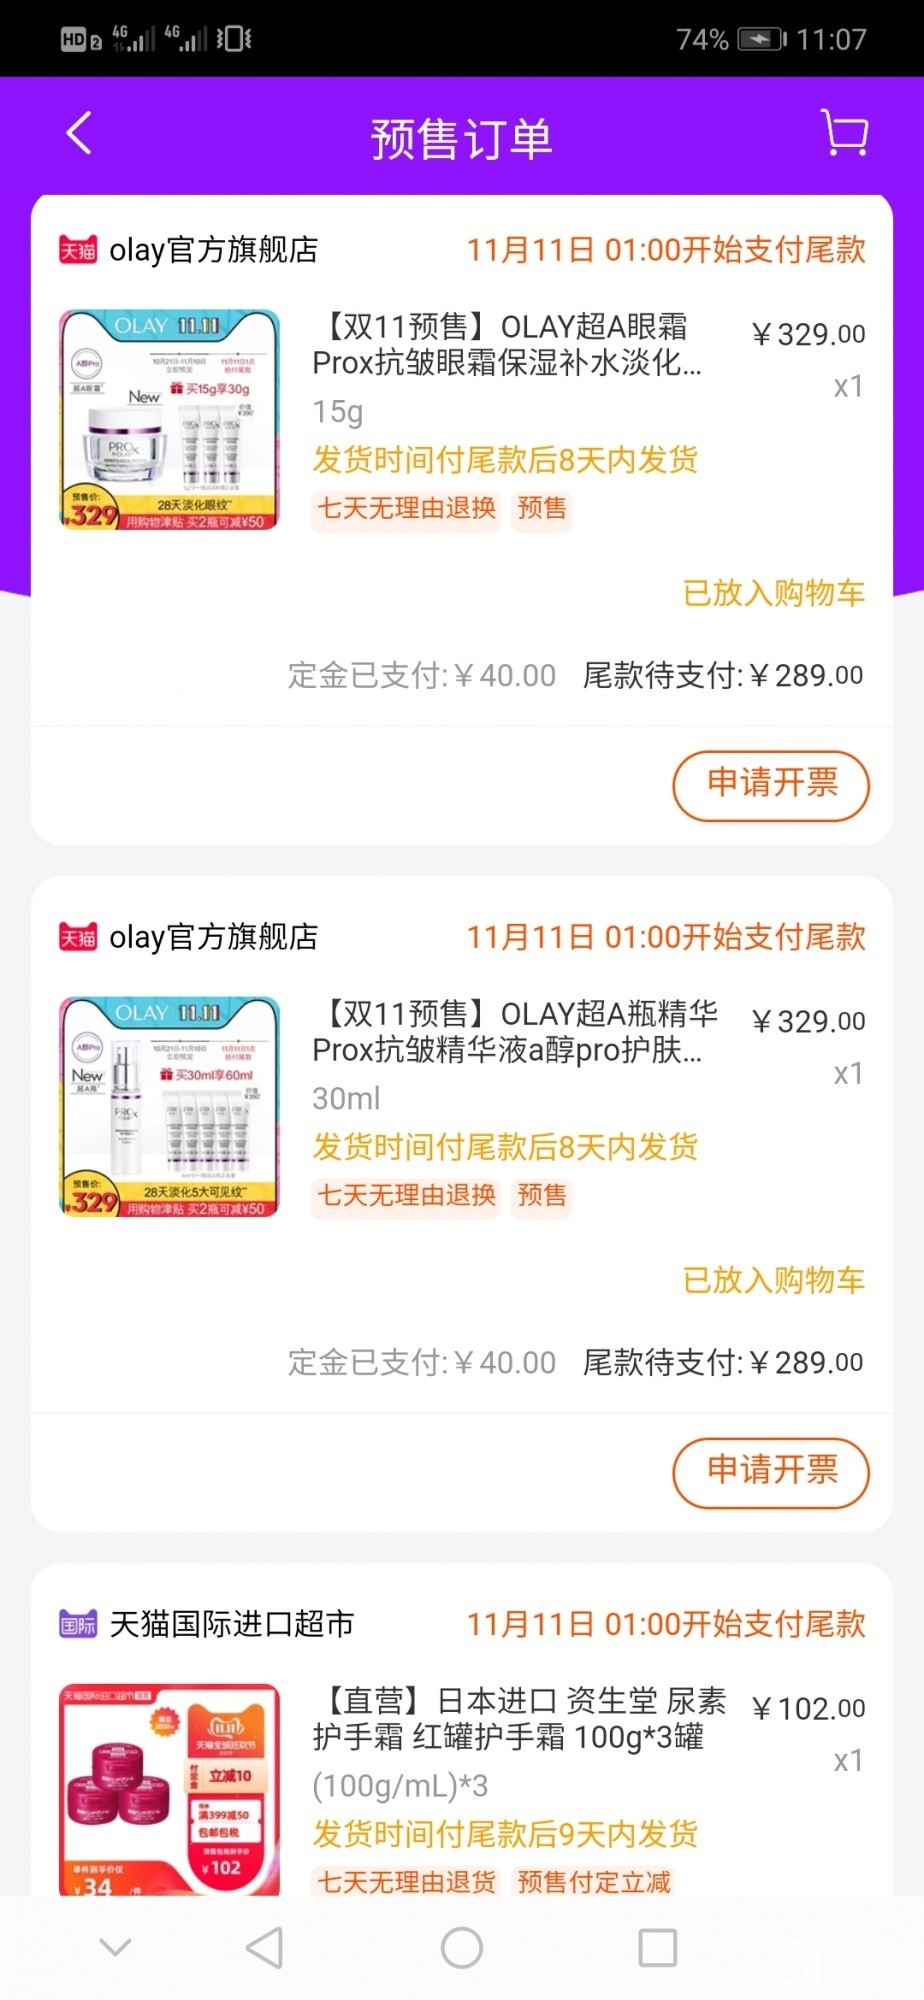 Screenshot_20191031_230739_com.taobao.taobao.jpg